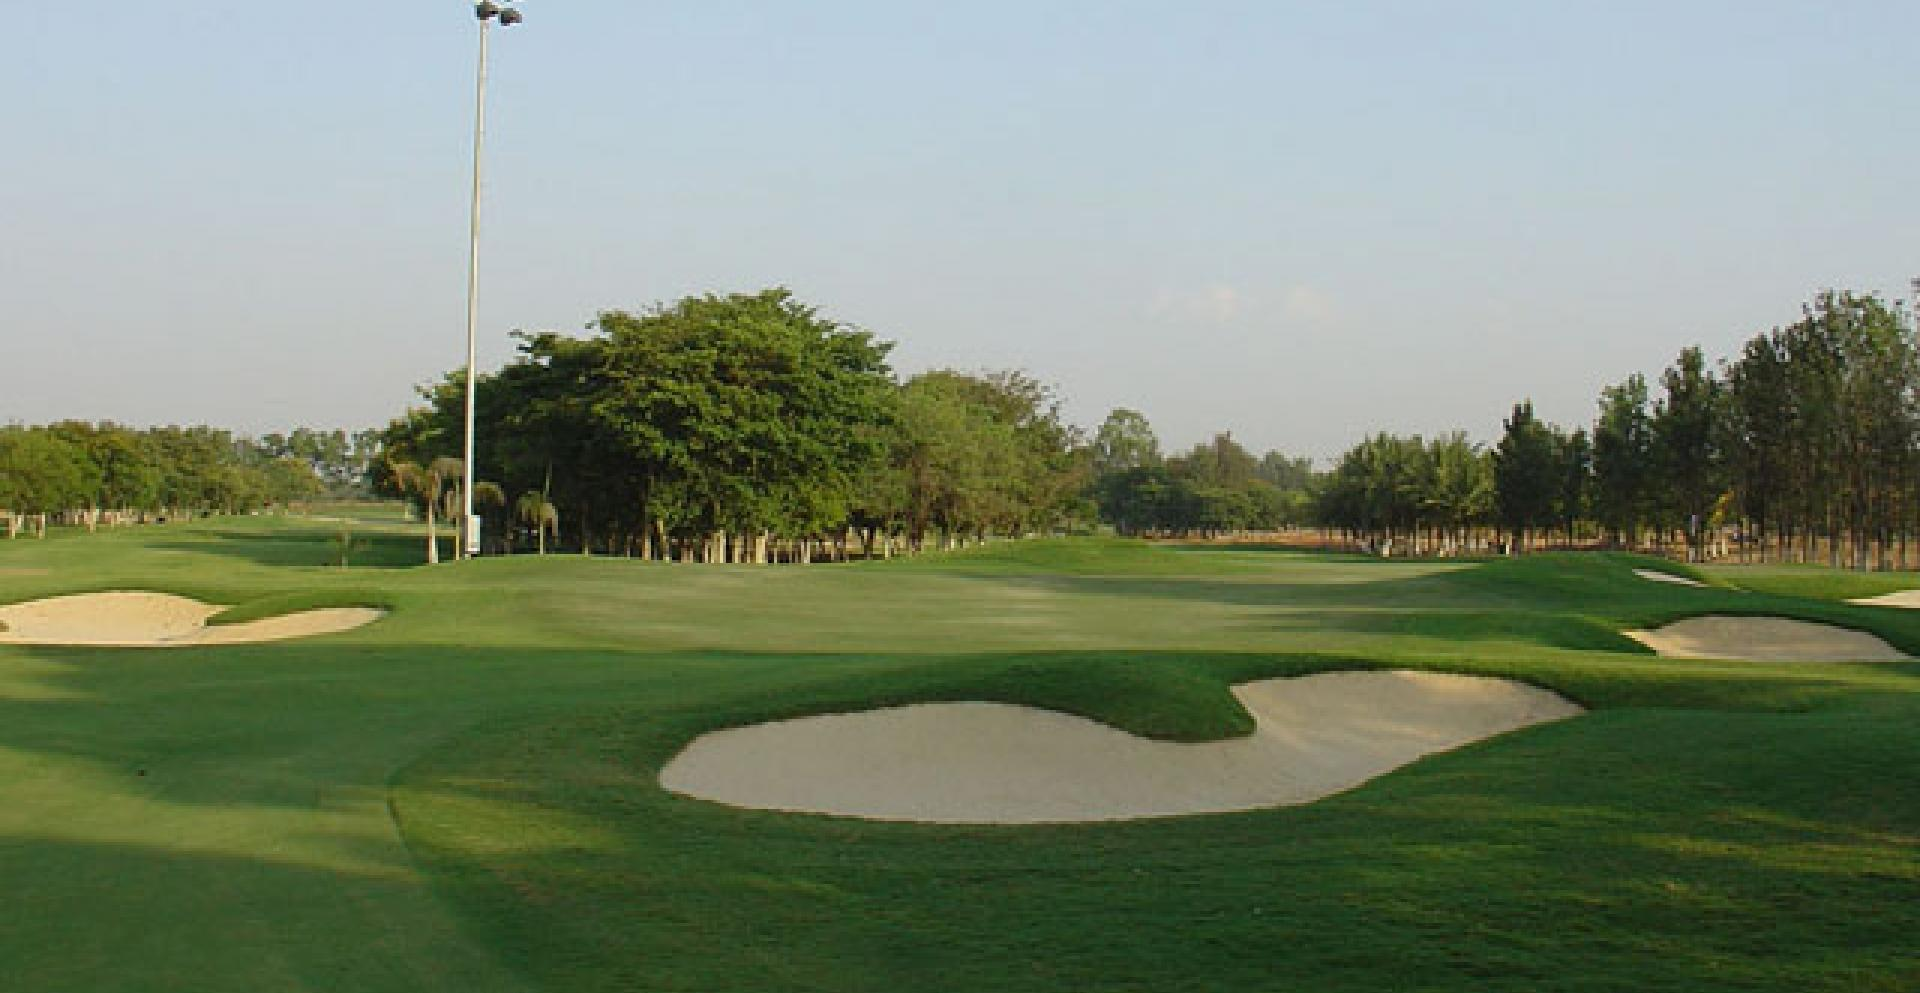 Karnataka Golf Association, India